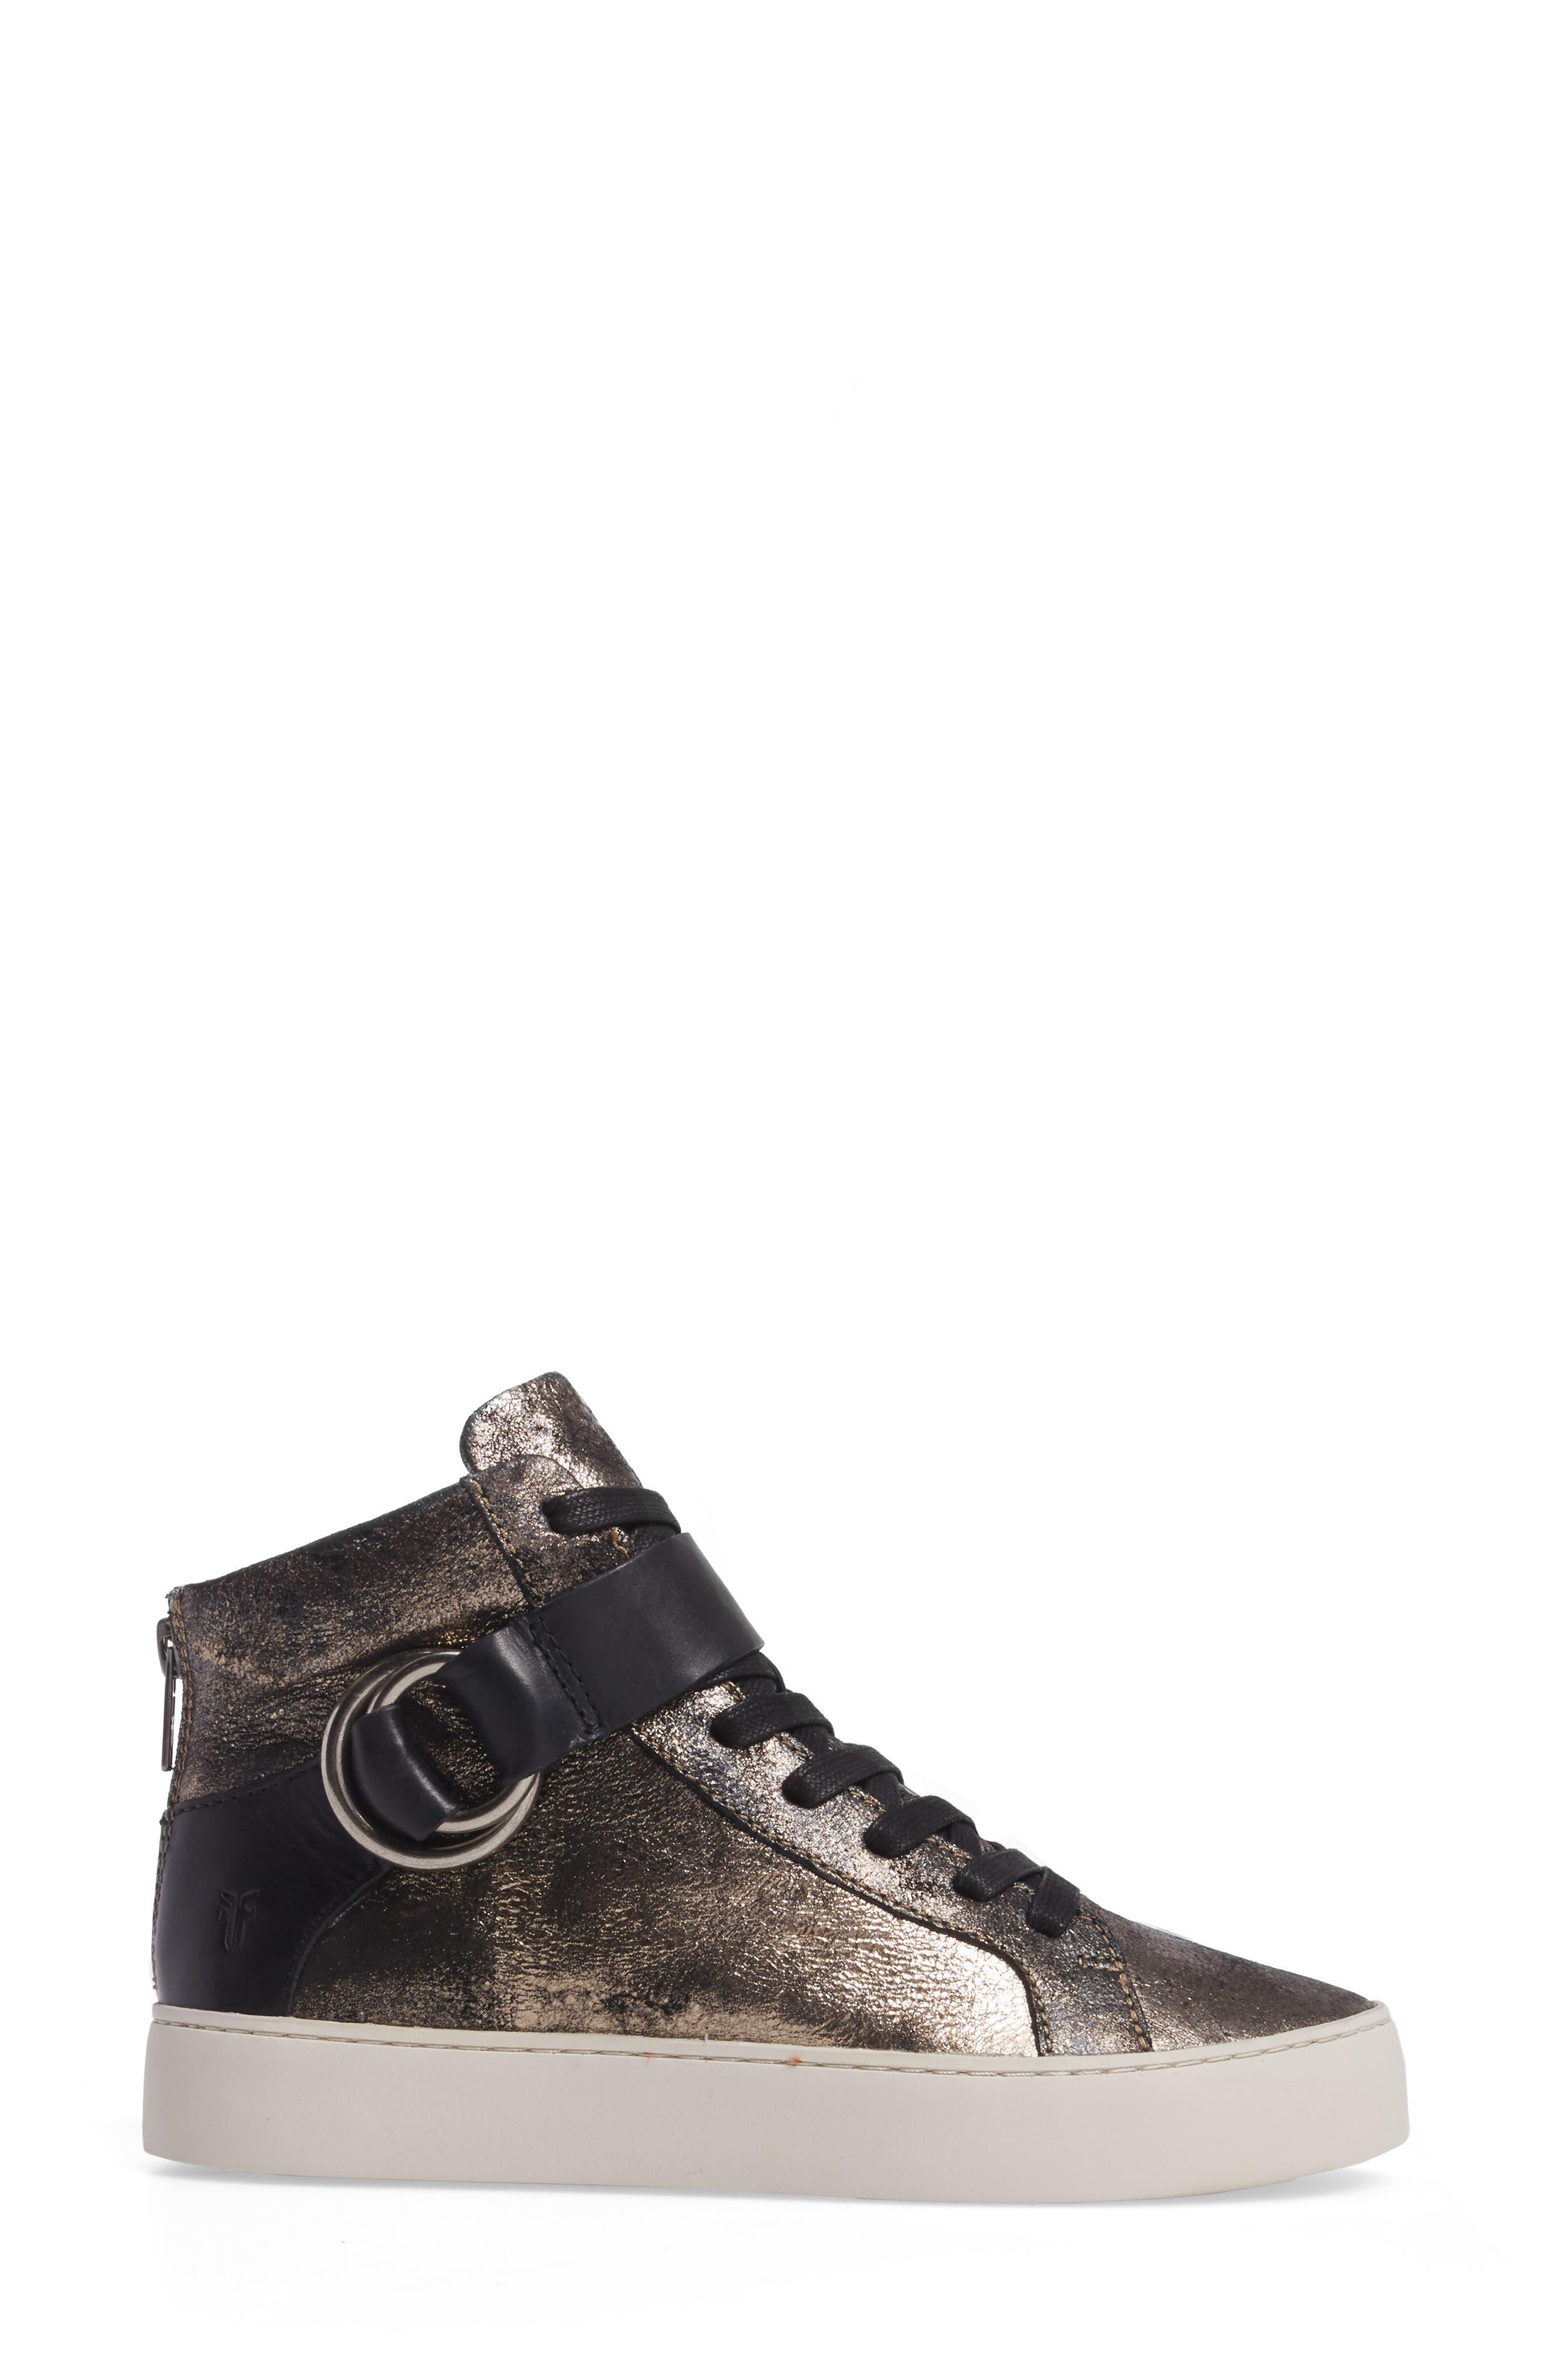 Lena Harness High Top Sneaker,                             Alternate thumbnail 3, color,                             Gunmetal